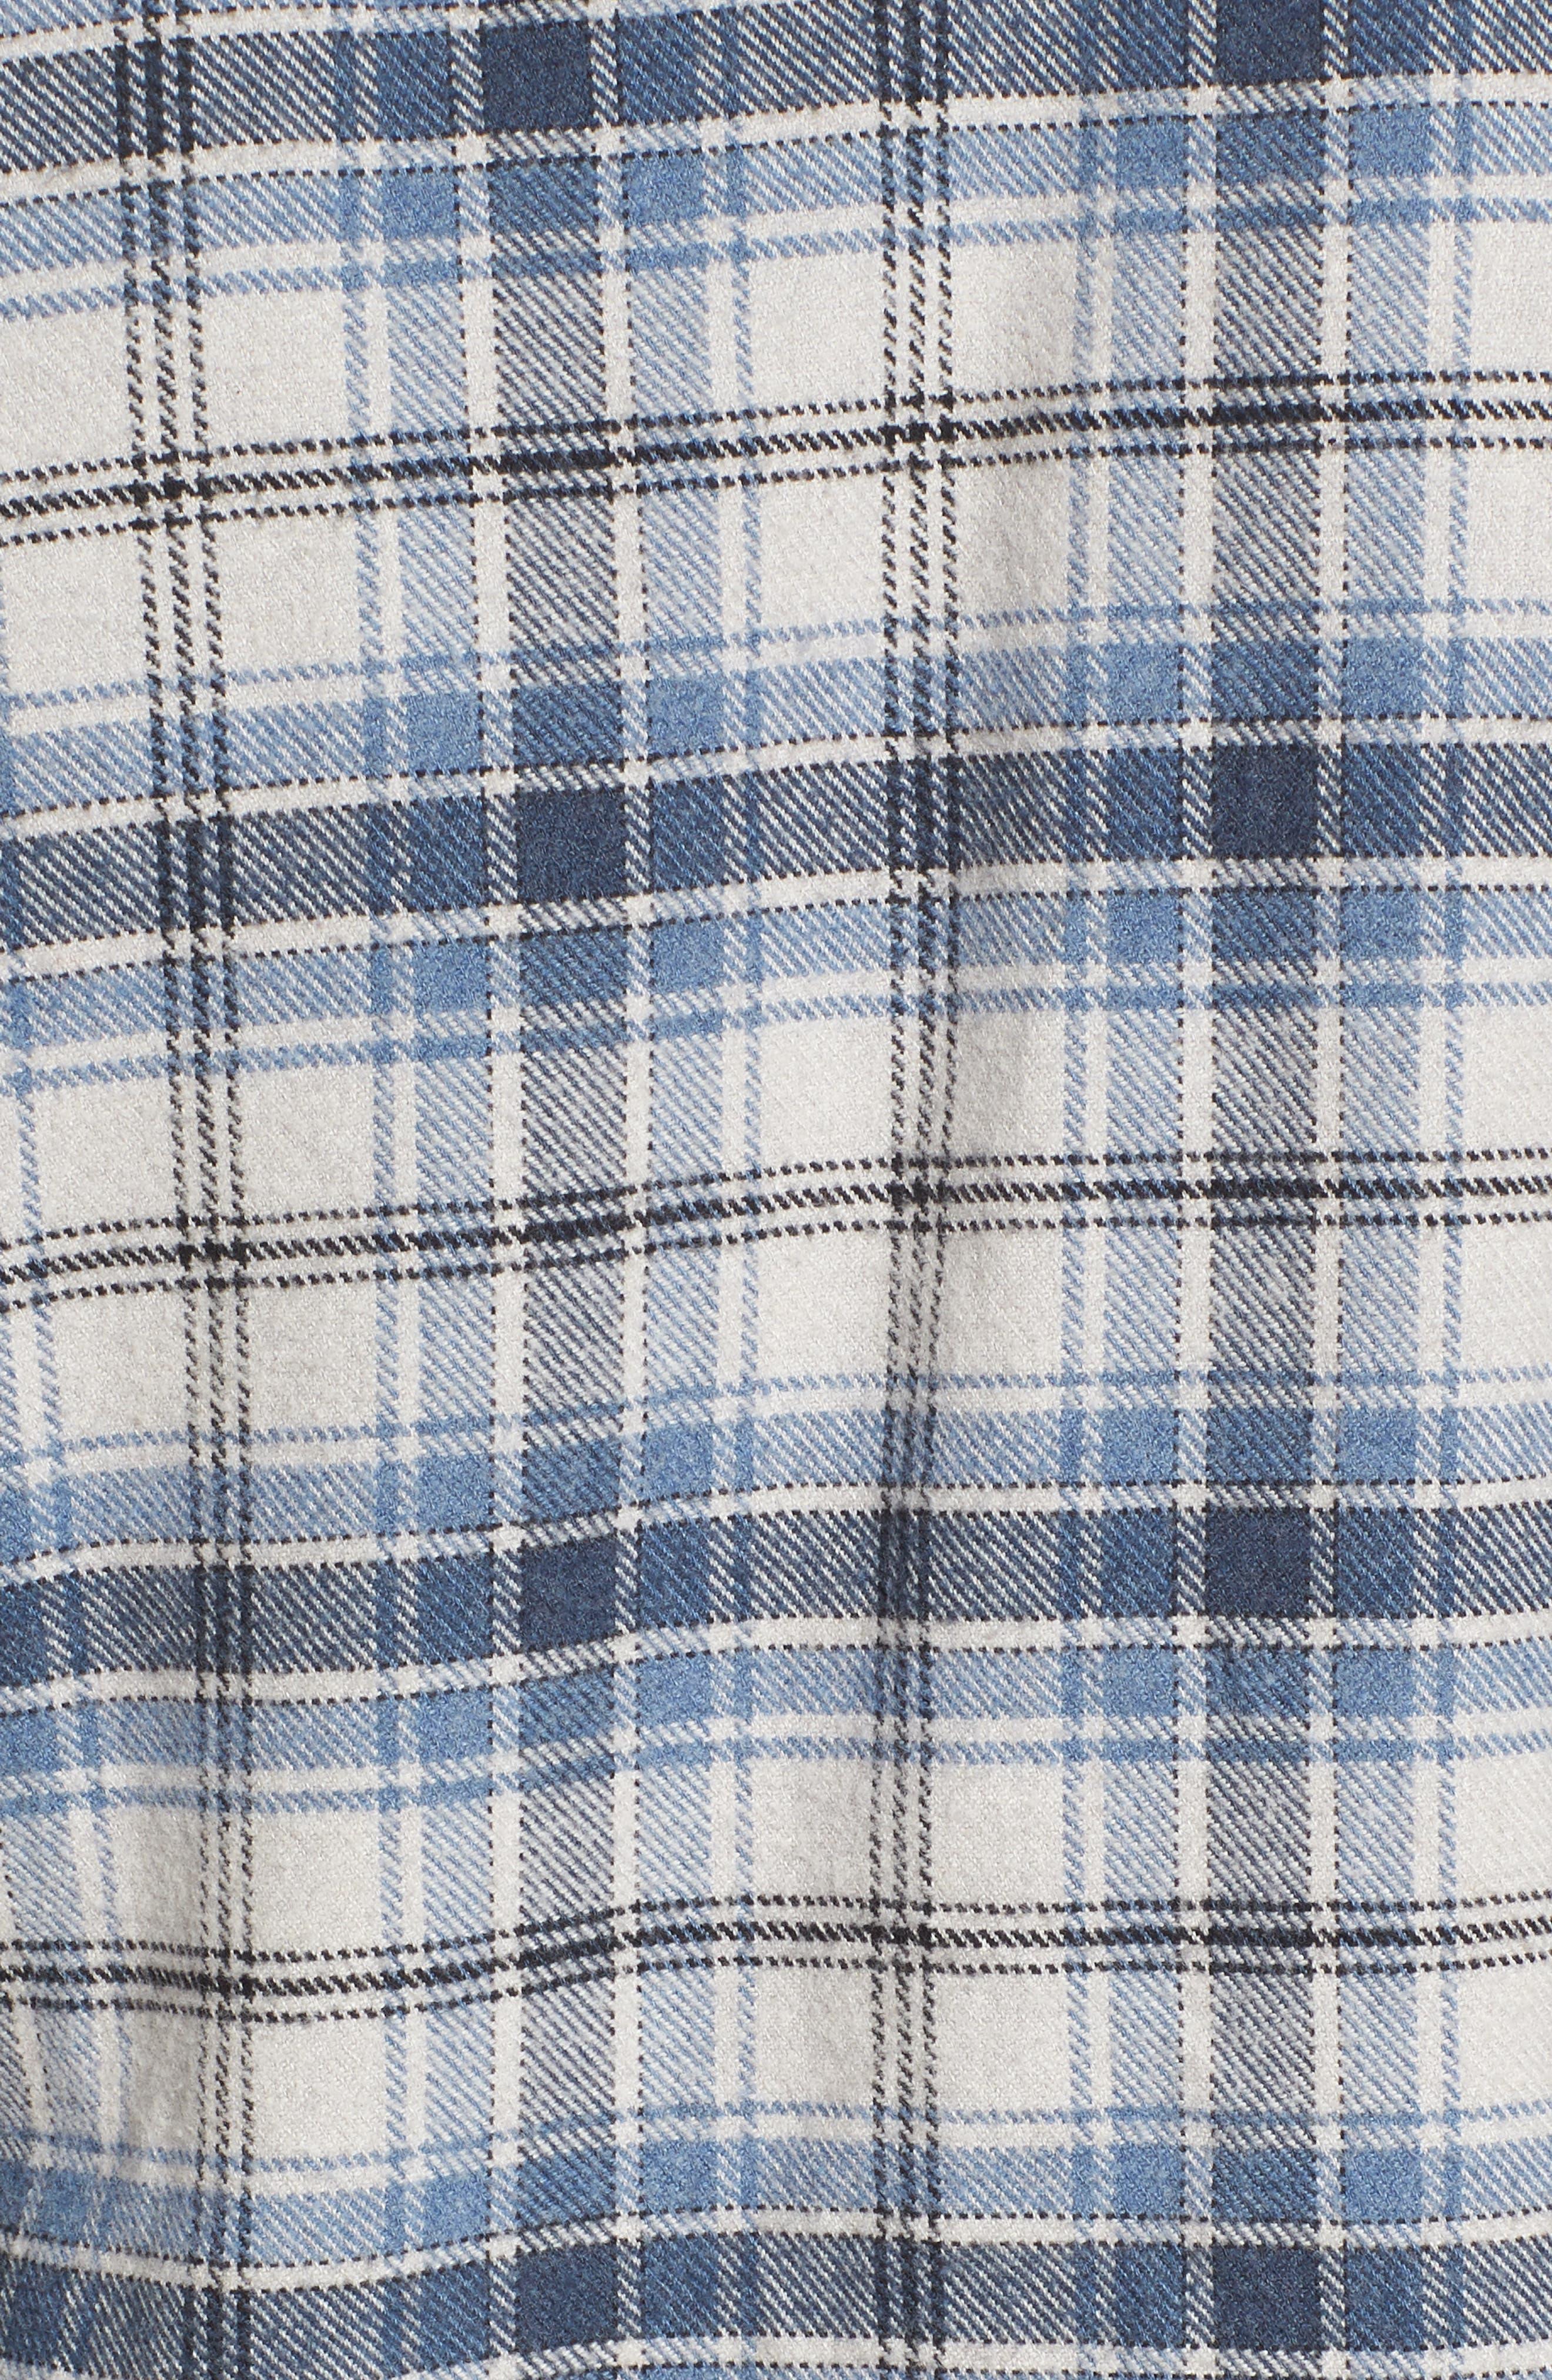 Campton Heritage Plaid Flannel Shirt,                             Alternate thumbnail 5, color,                             Blue Stone